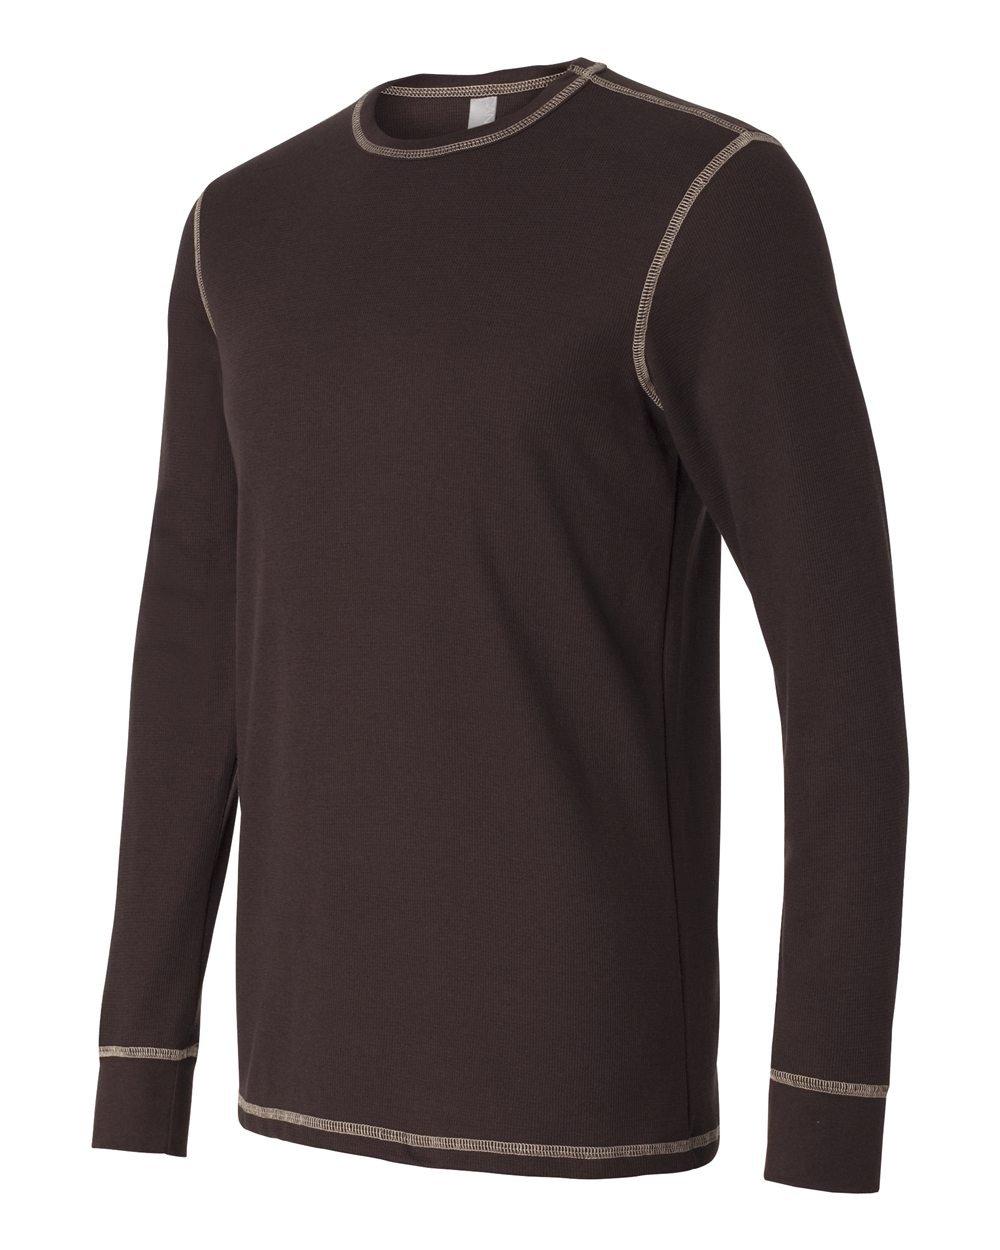 Bella And Canvas Long Sleeve Thermal T Shirt Evan